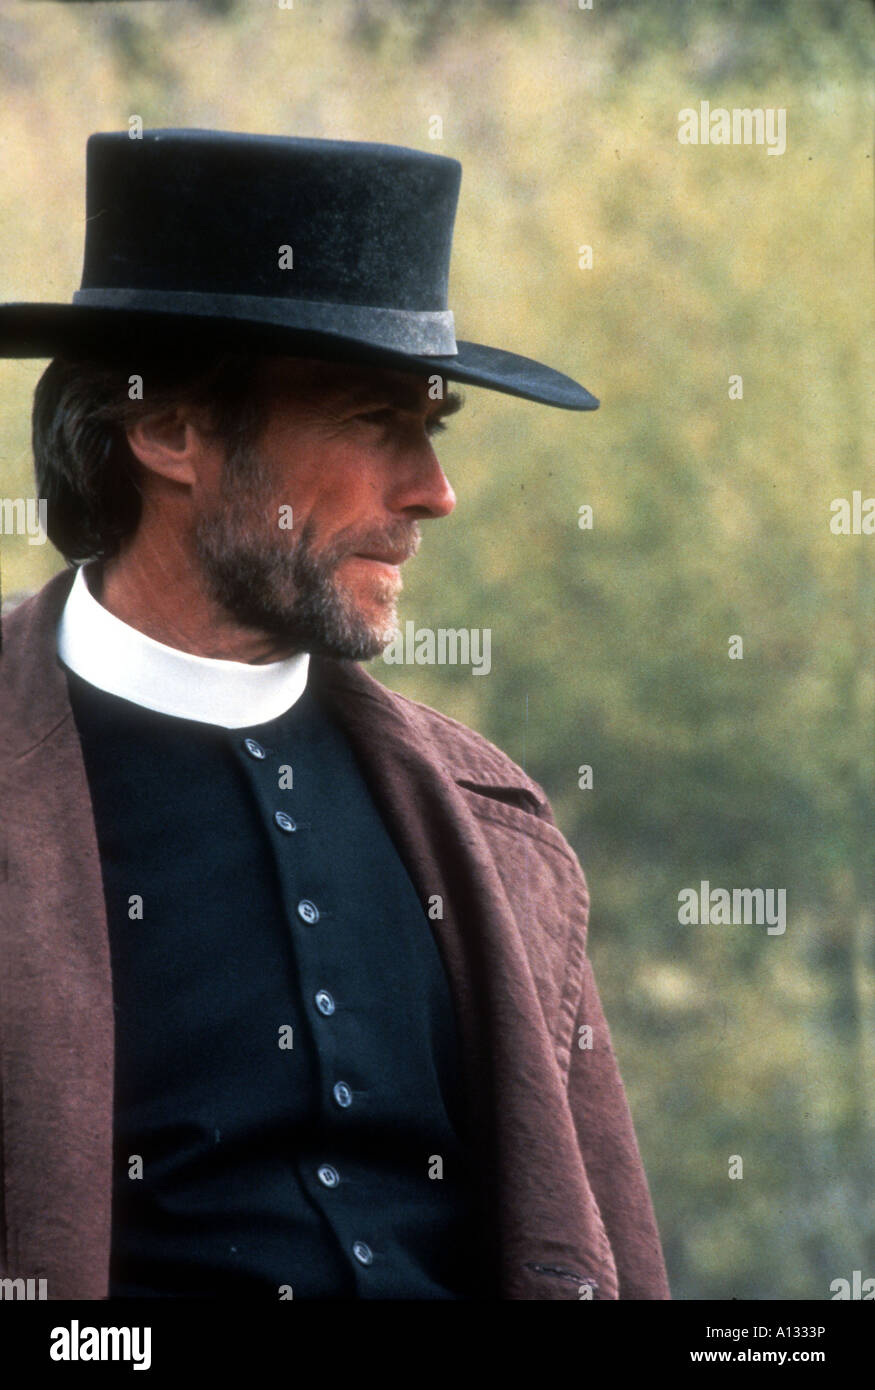 Pale Rider 1984 Clint Eastwood Clint Eastwood Stock Photo  10127193 ... f4e0904da52